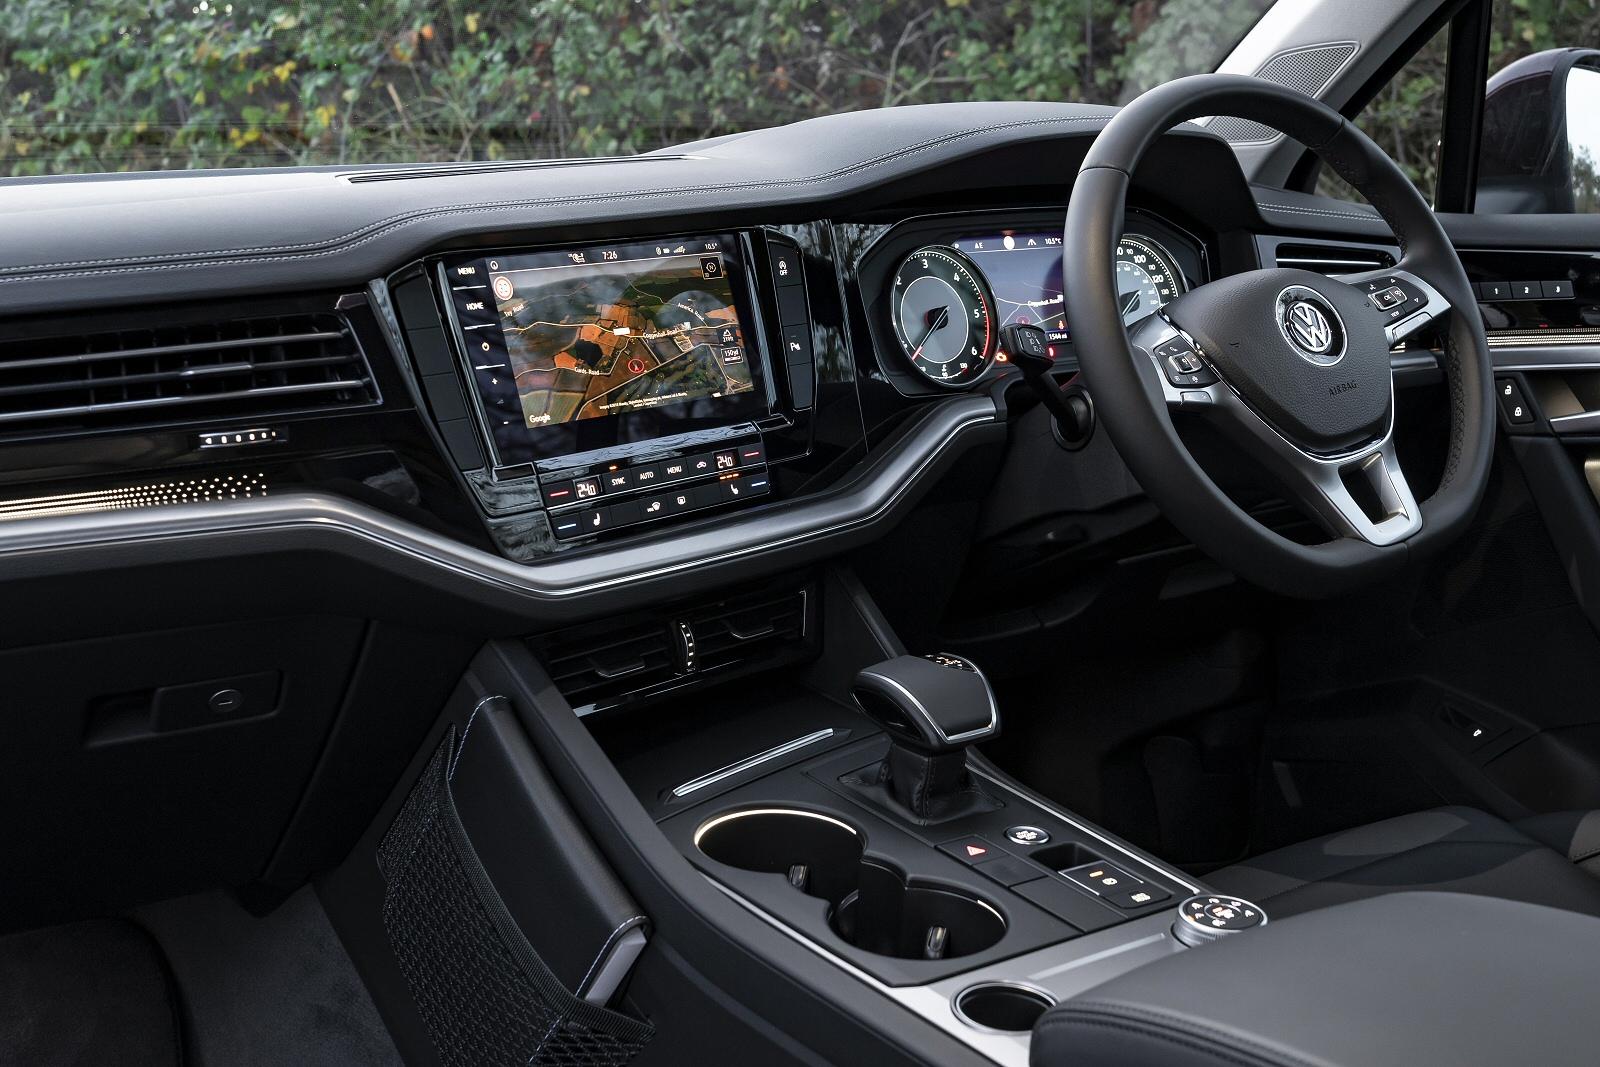 Volkswagen Touareg 3.0TDI (286ps) Black Edition 4Motion 5dr + DYNAUDIO/EXTRAS